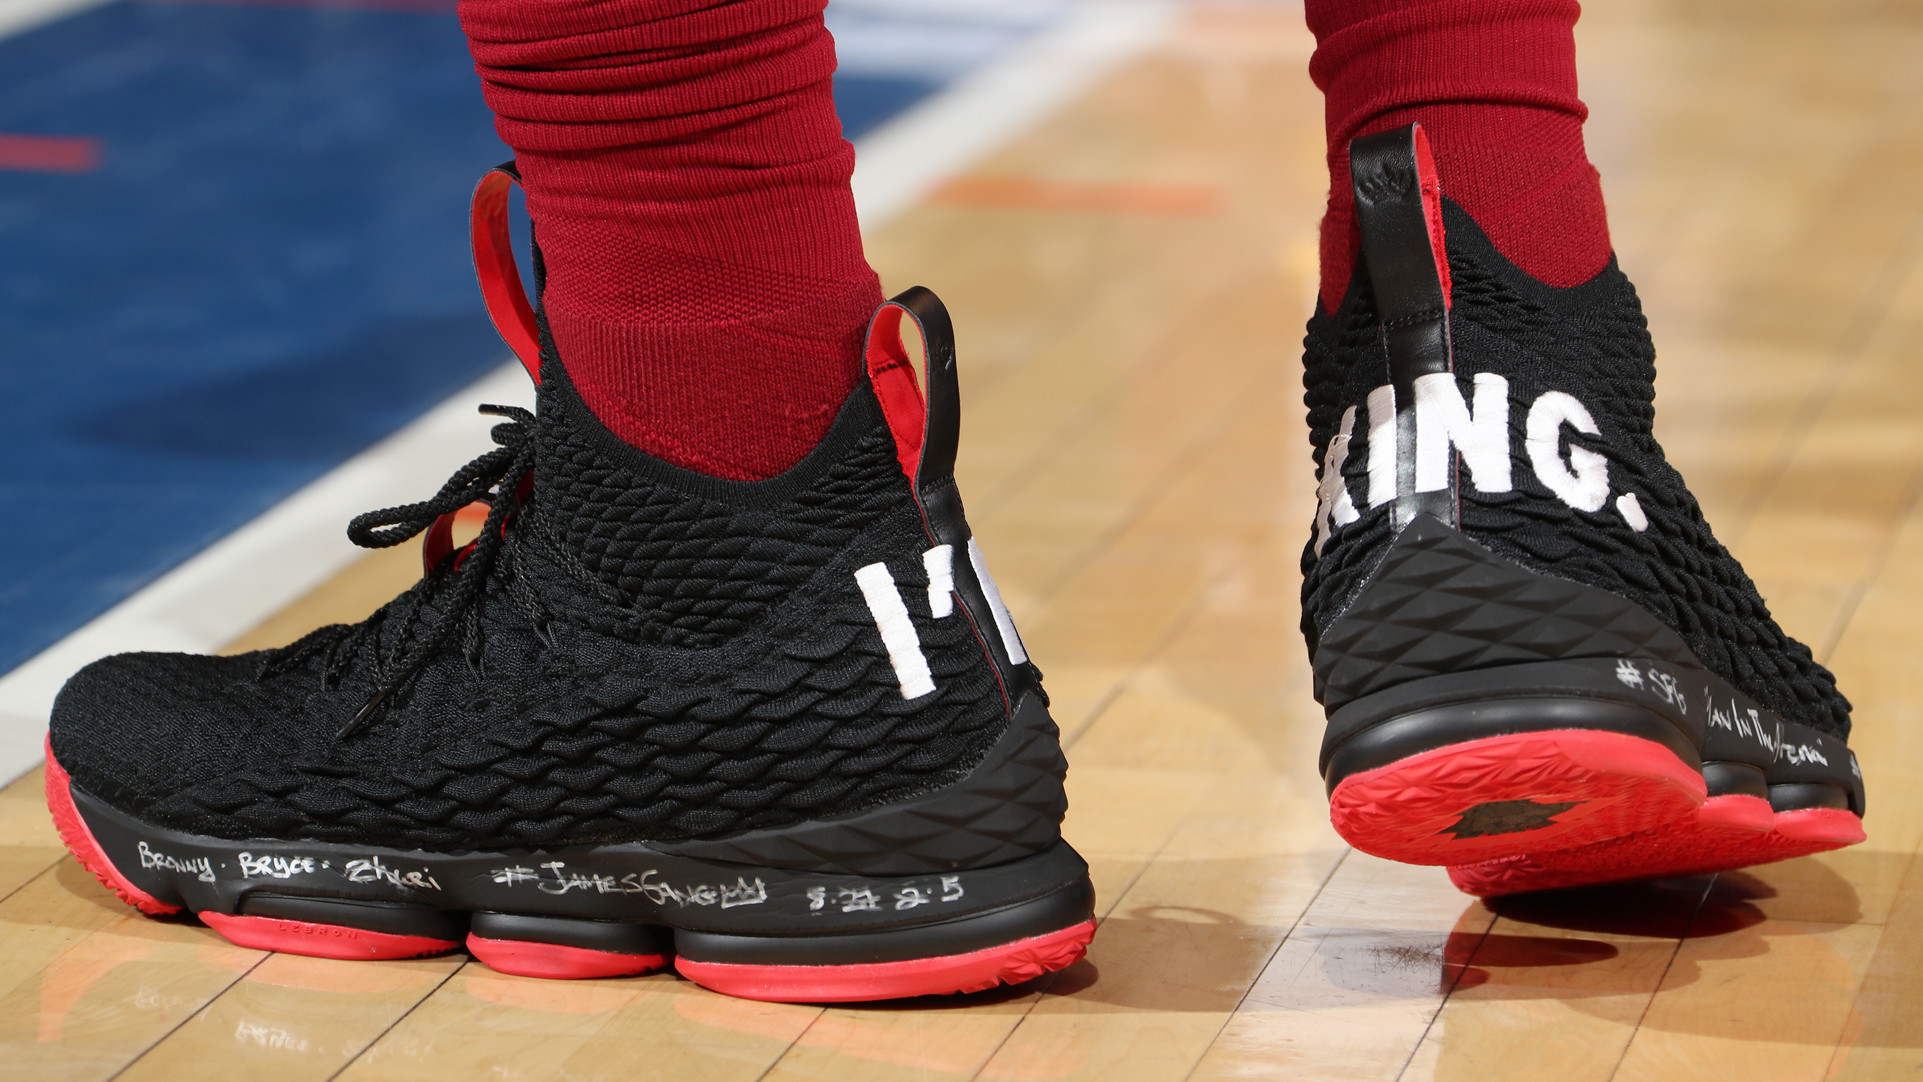 online store 72504 7f546 LeBron James Debuts Nike LeBron 15 'I'm King' PE | Sole ...